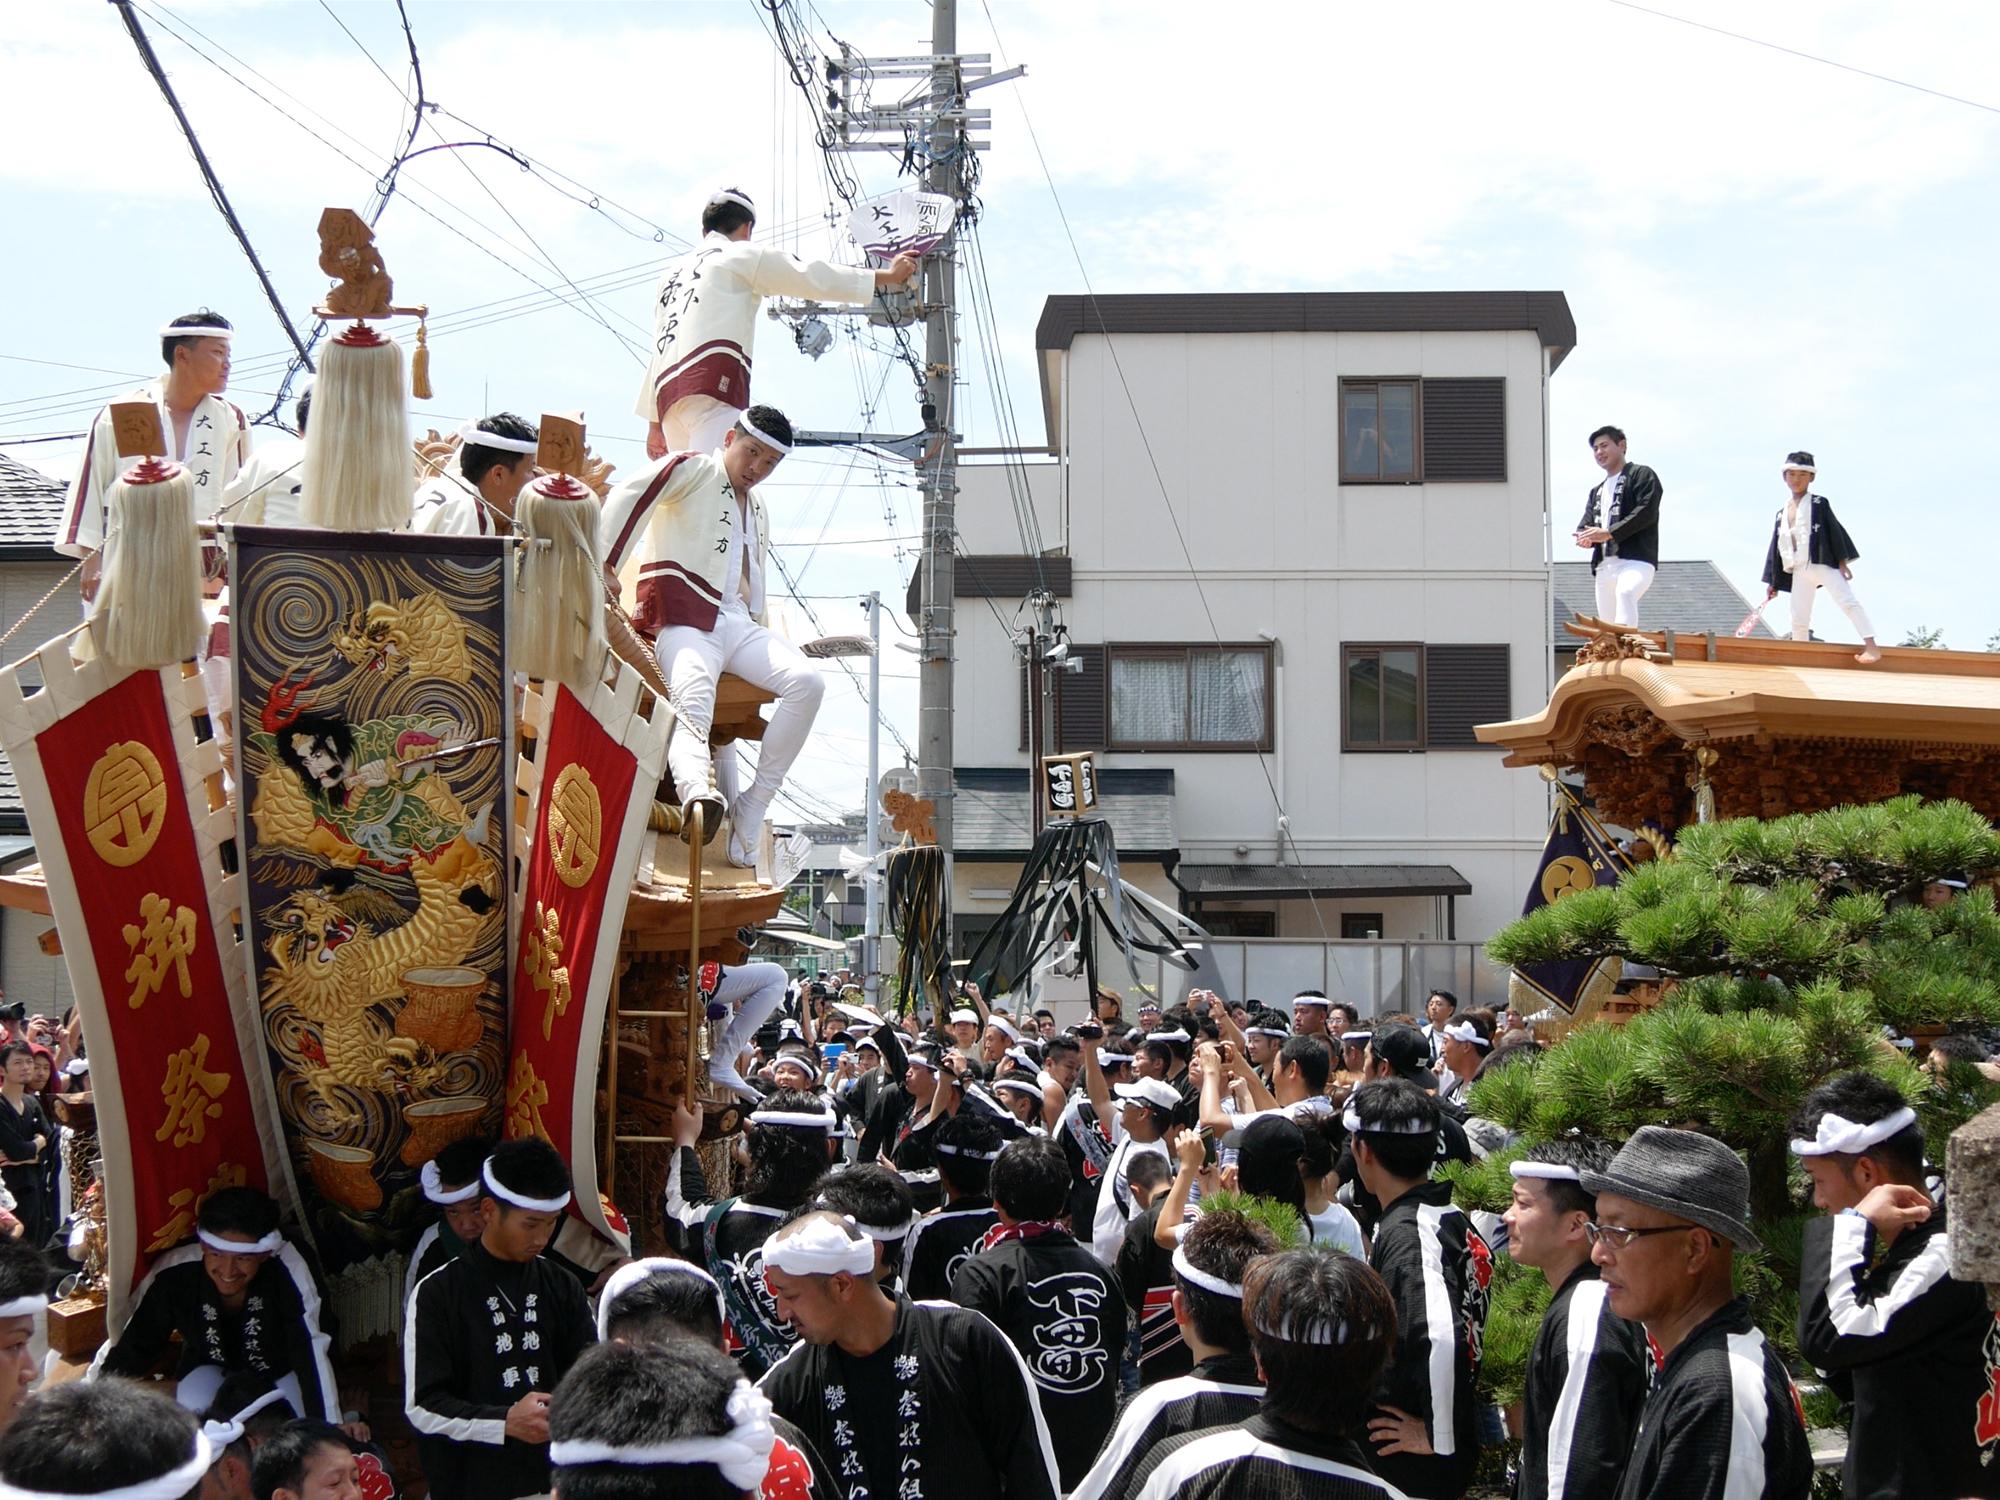 miyayama-nyukon-2.jpg